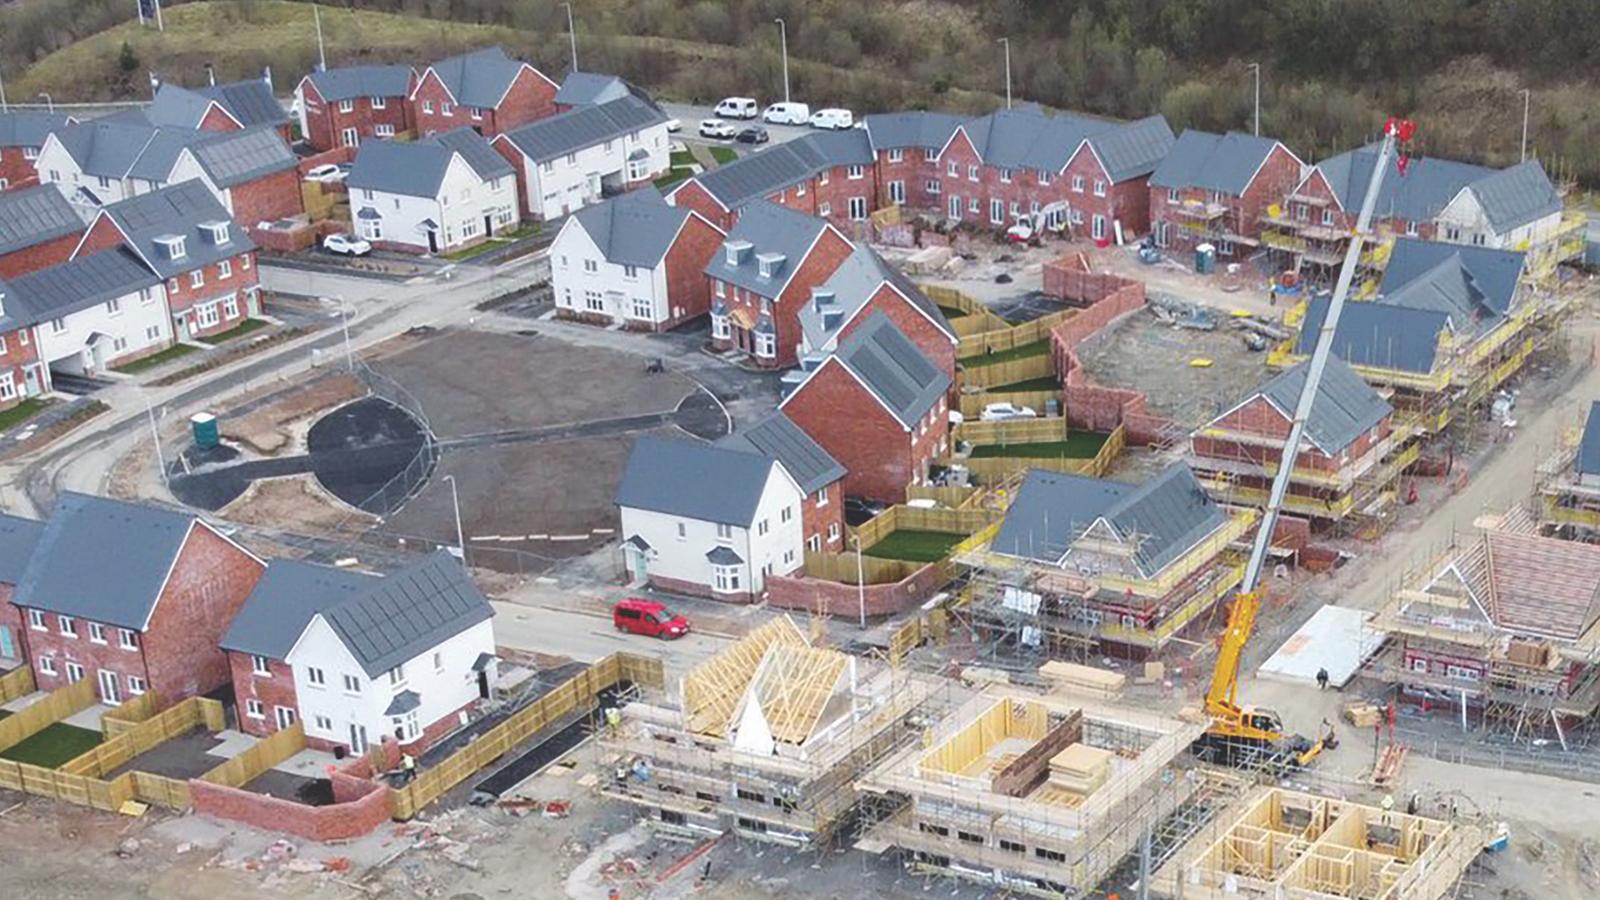 Construction work on Sero's low-carbon development at Parc Eirin, Tonyrefail